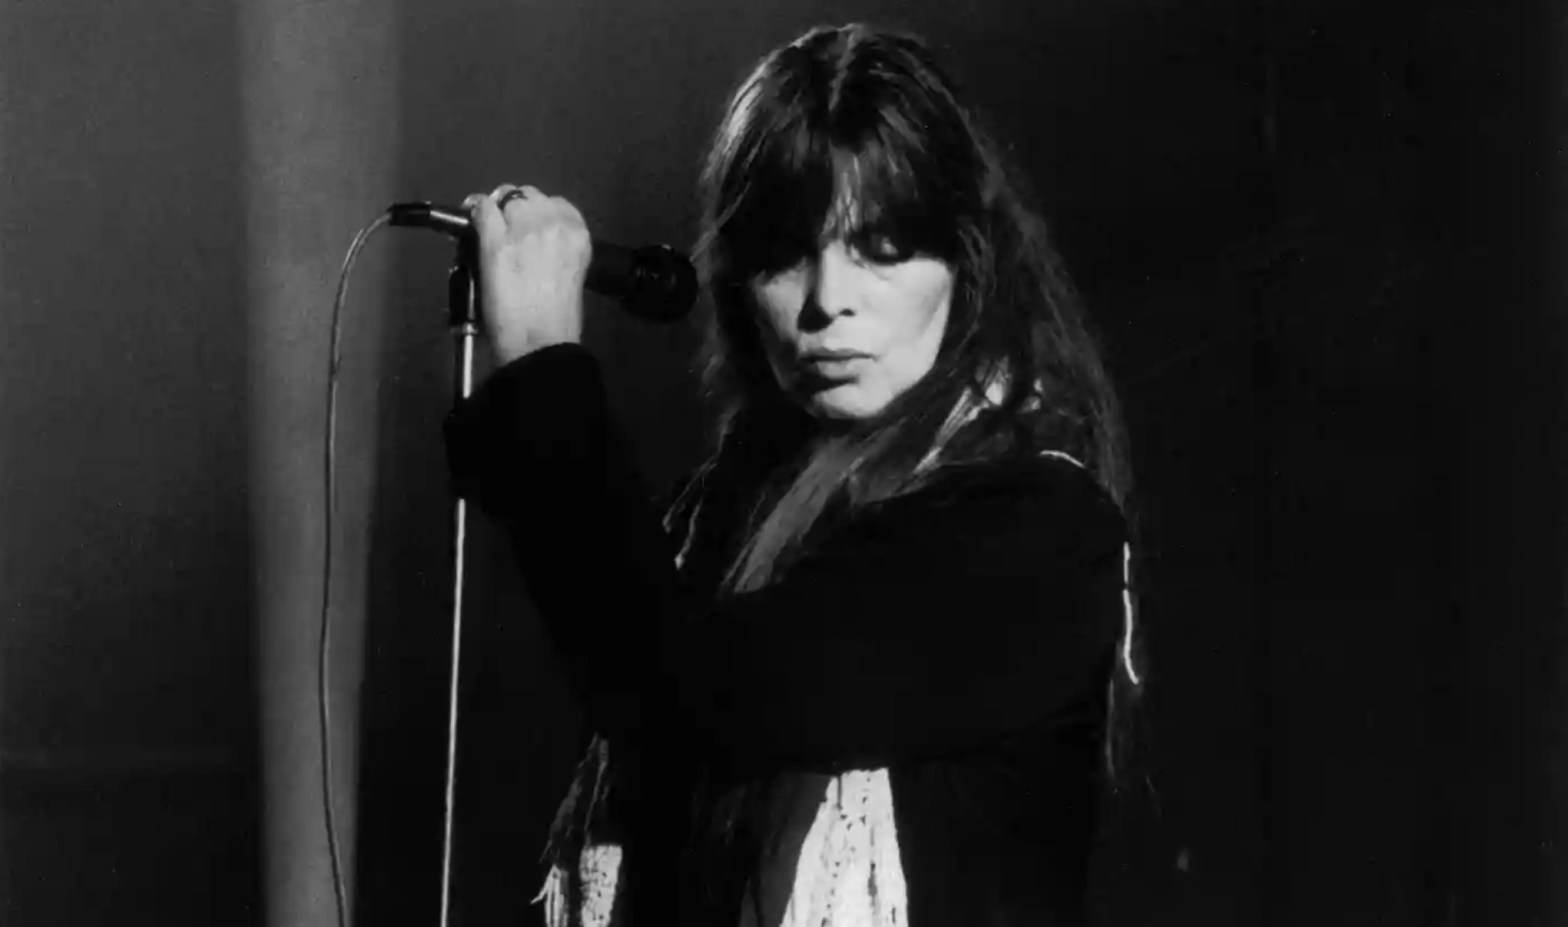 Nico bedded rock stars